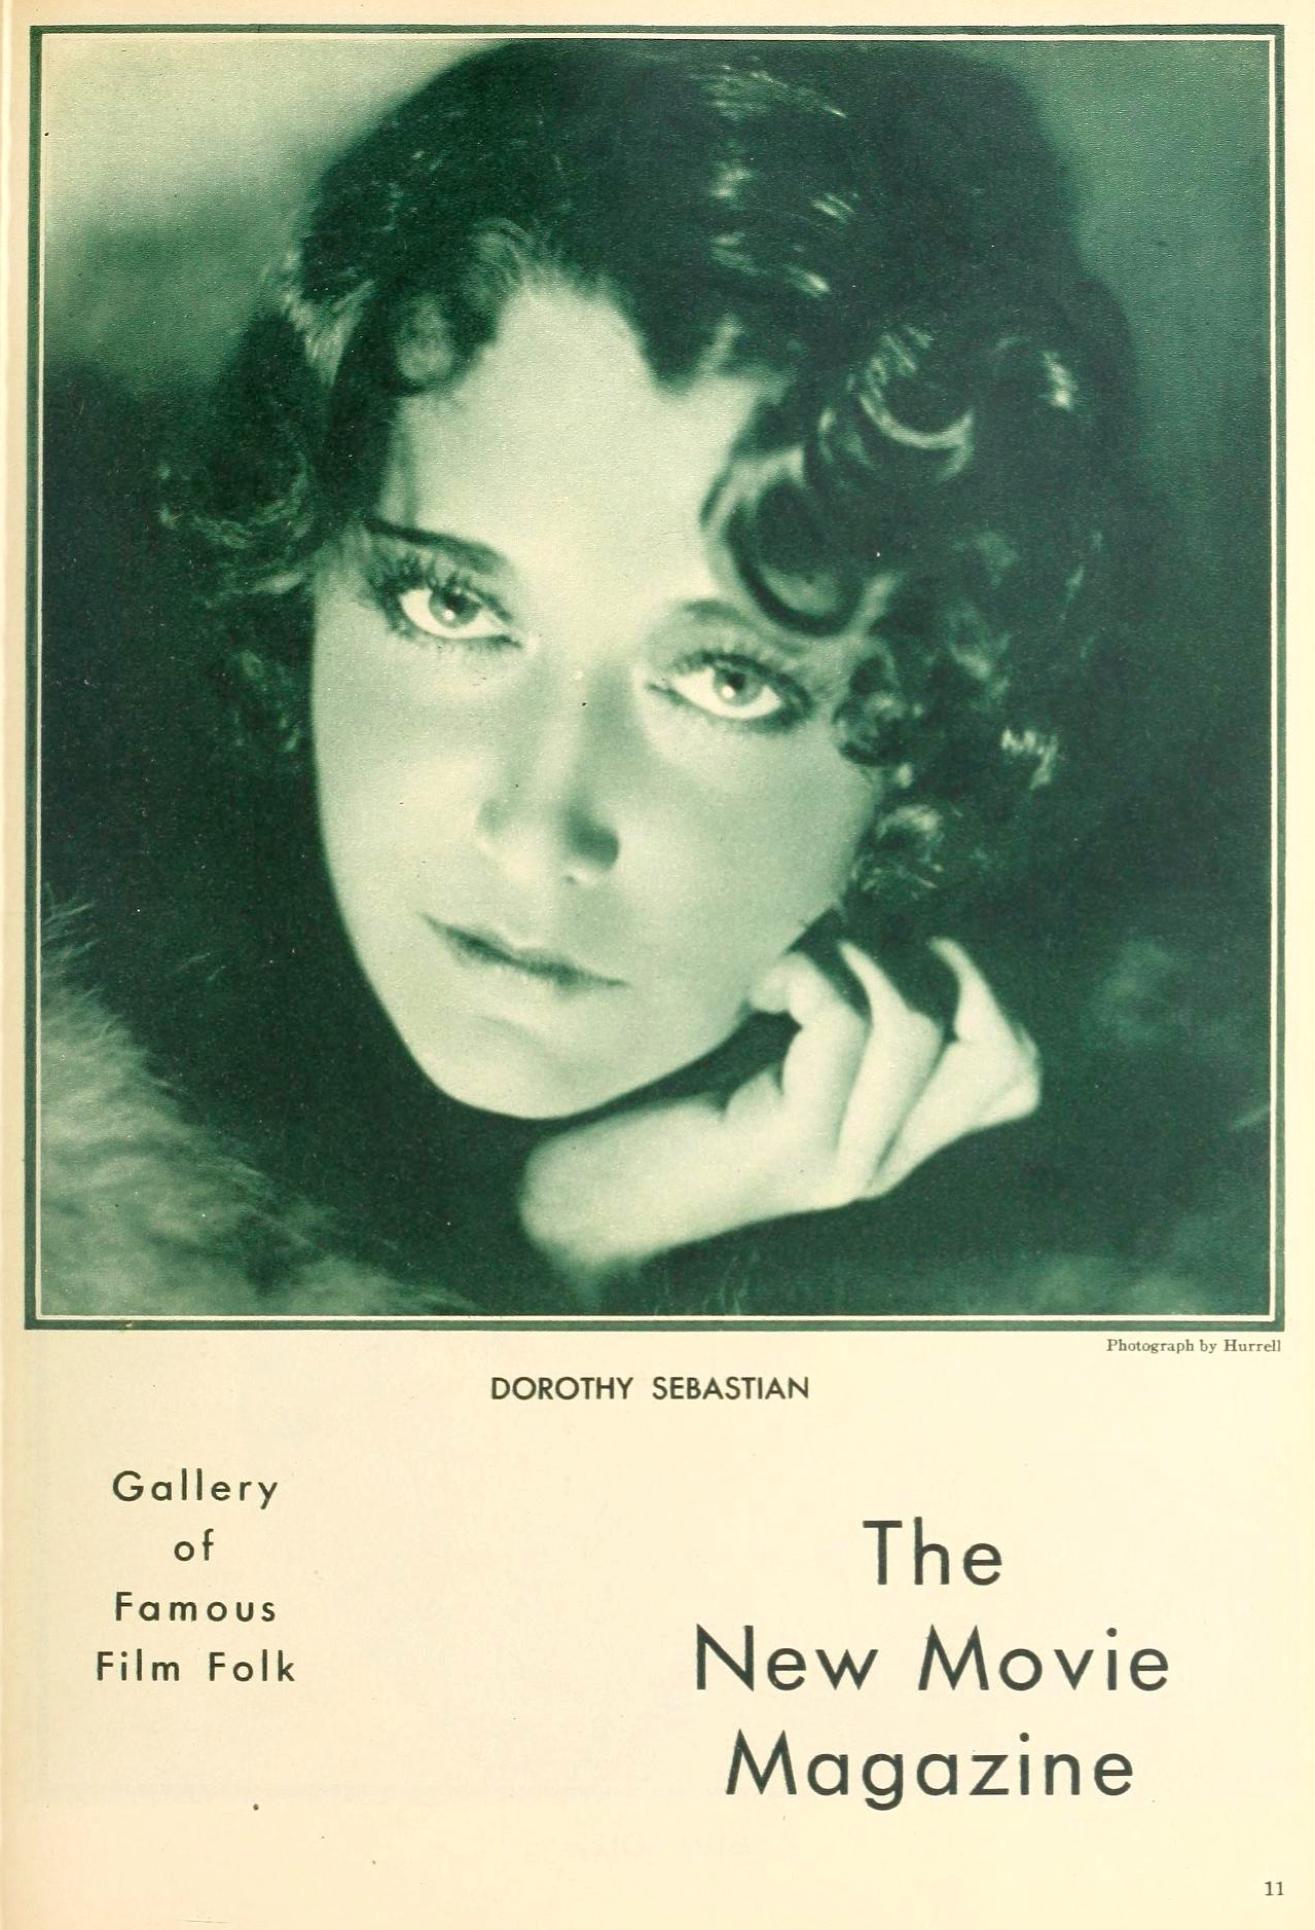 dorothy sebastian the new movie magazine april 1930a